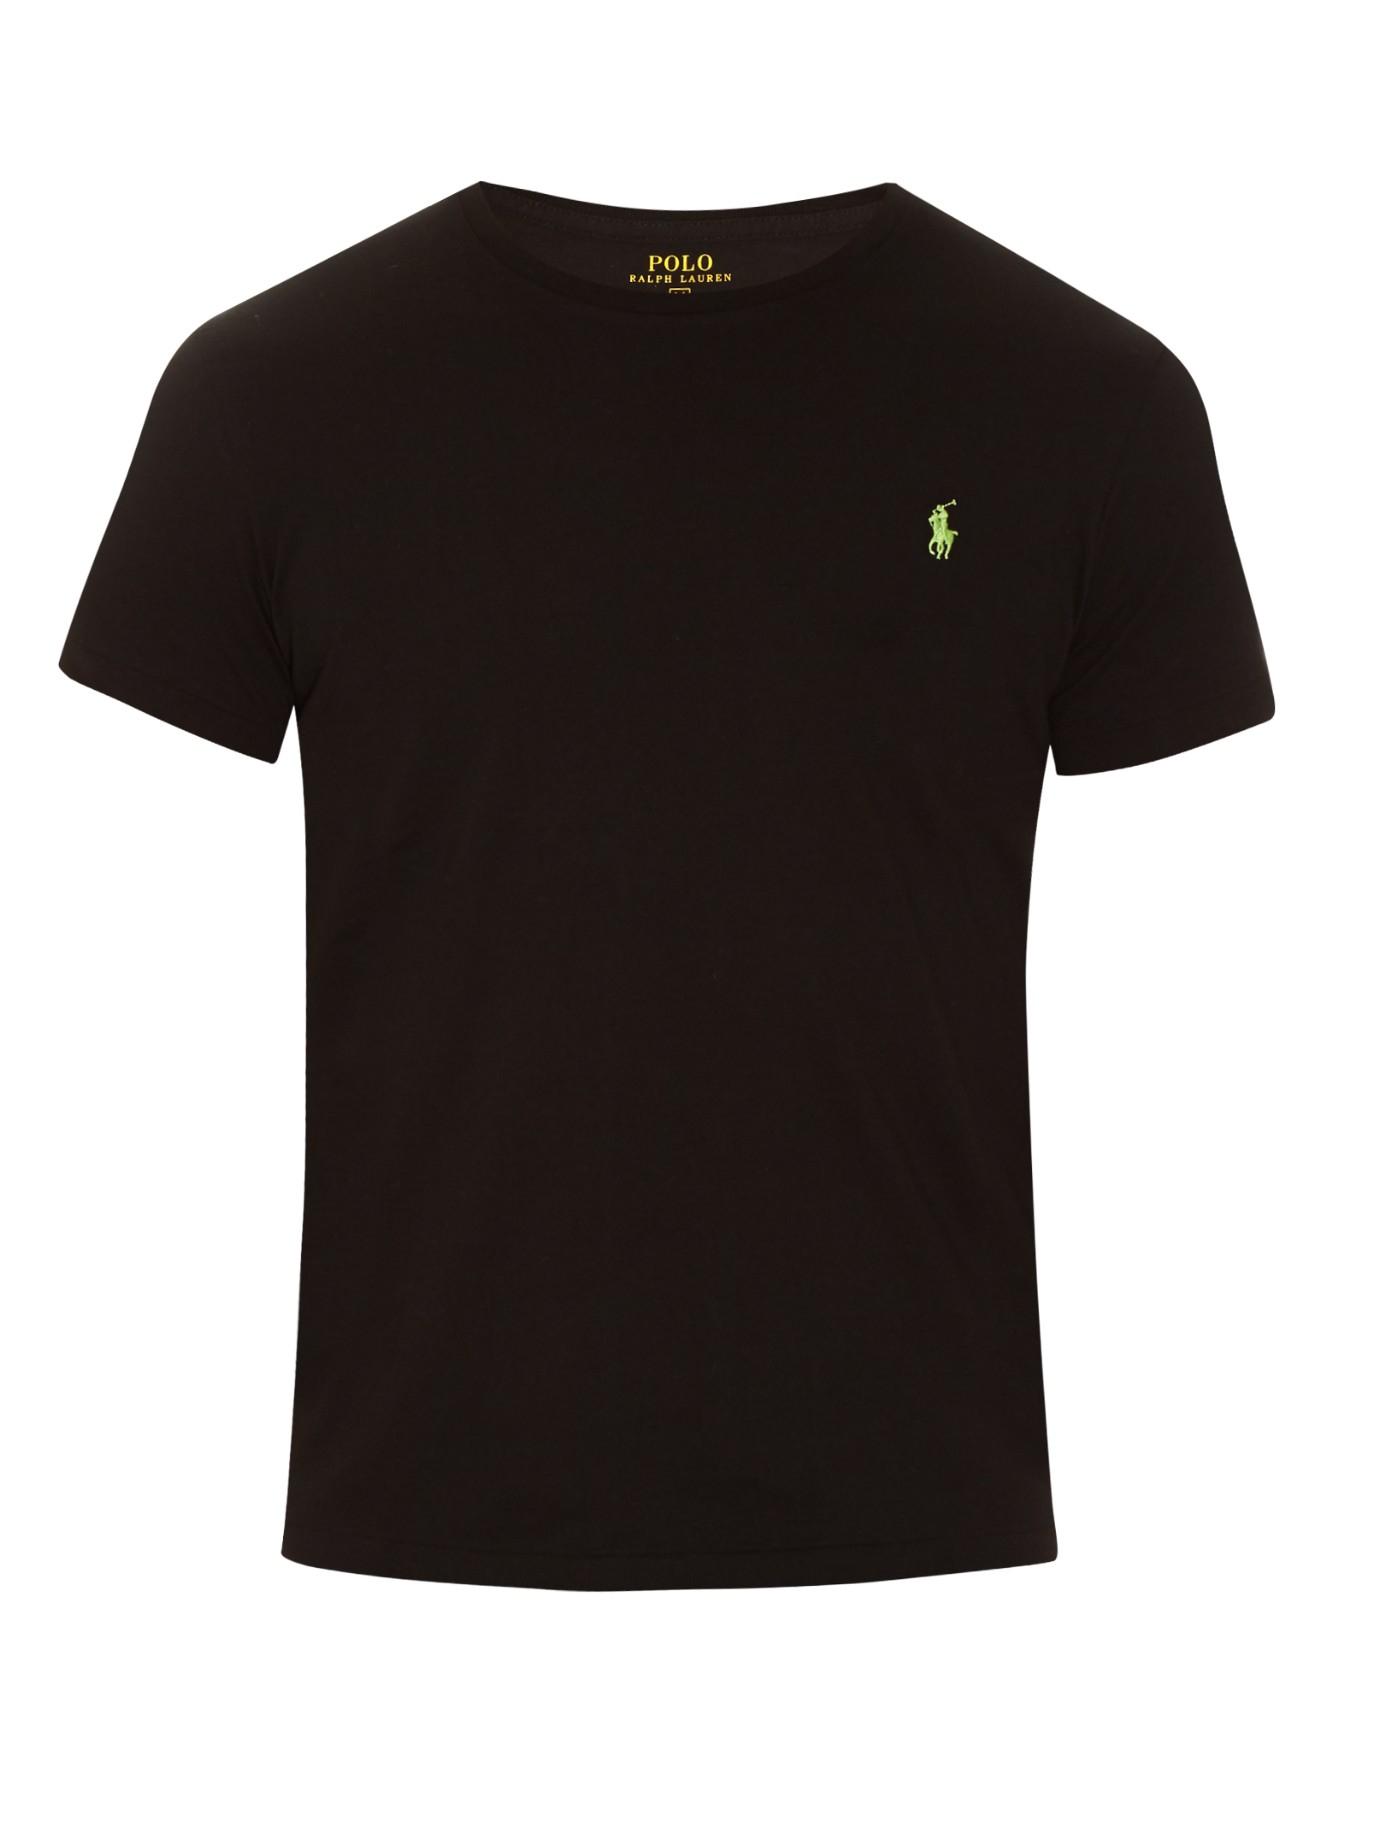 polo ralph lauren crew neck cotton t shirt in black for. Black Bedroom Furniture Sets. Home Design Ideas